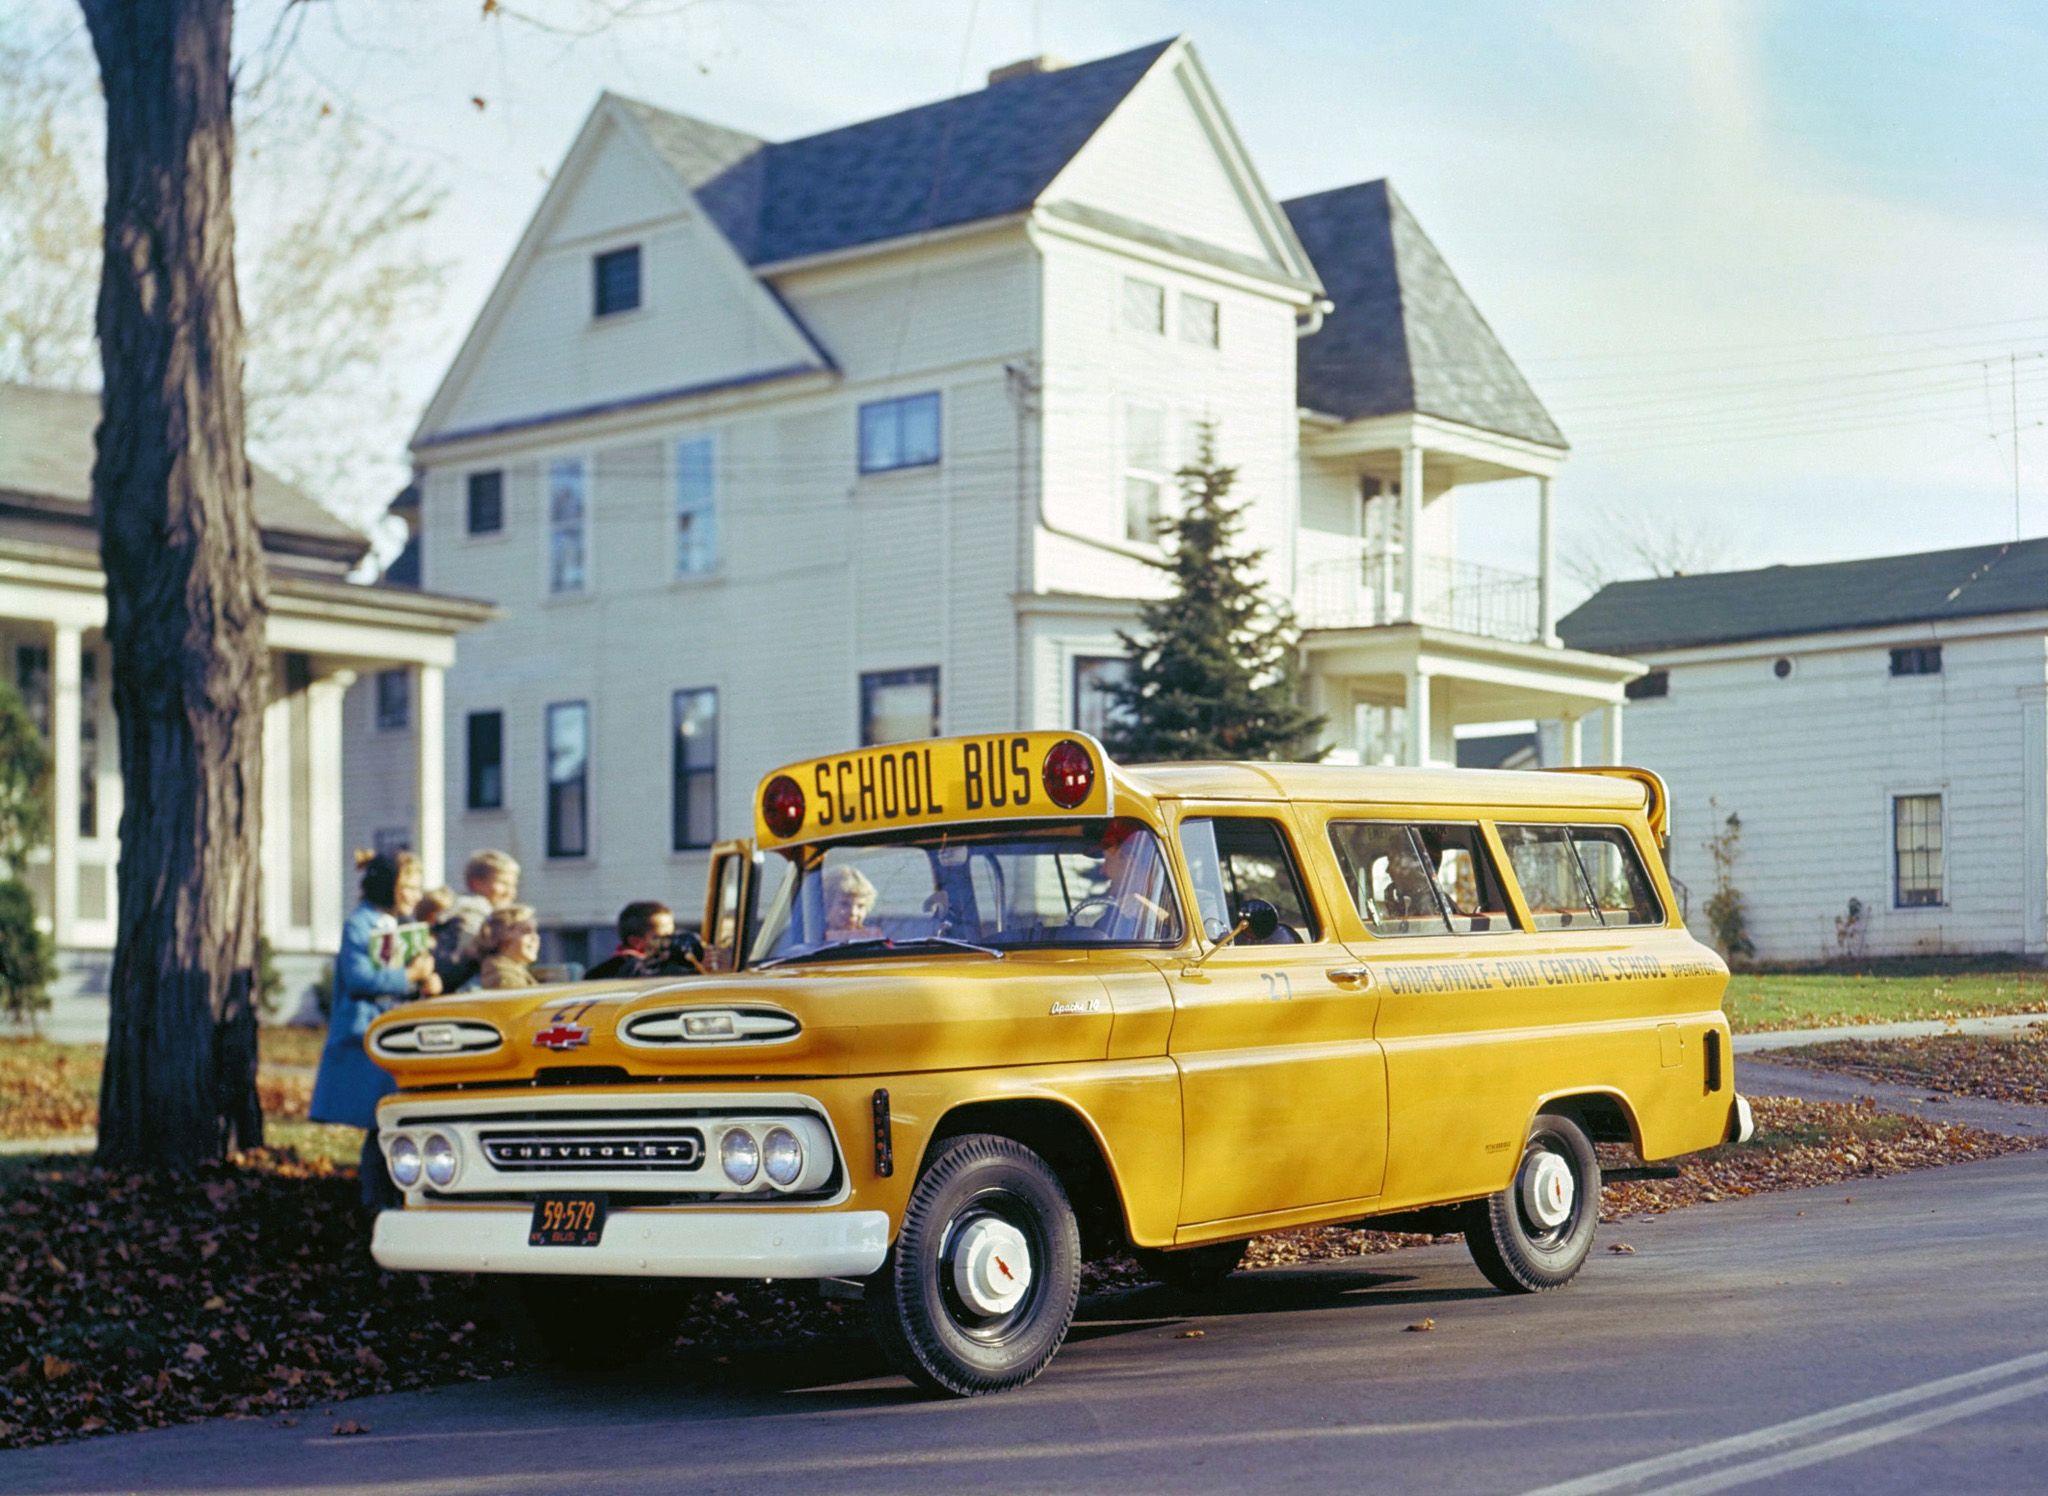 Chevrolet Suburban School Bus 1959 Chevrolet Suburban School